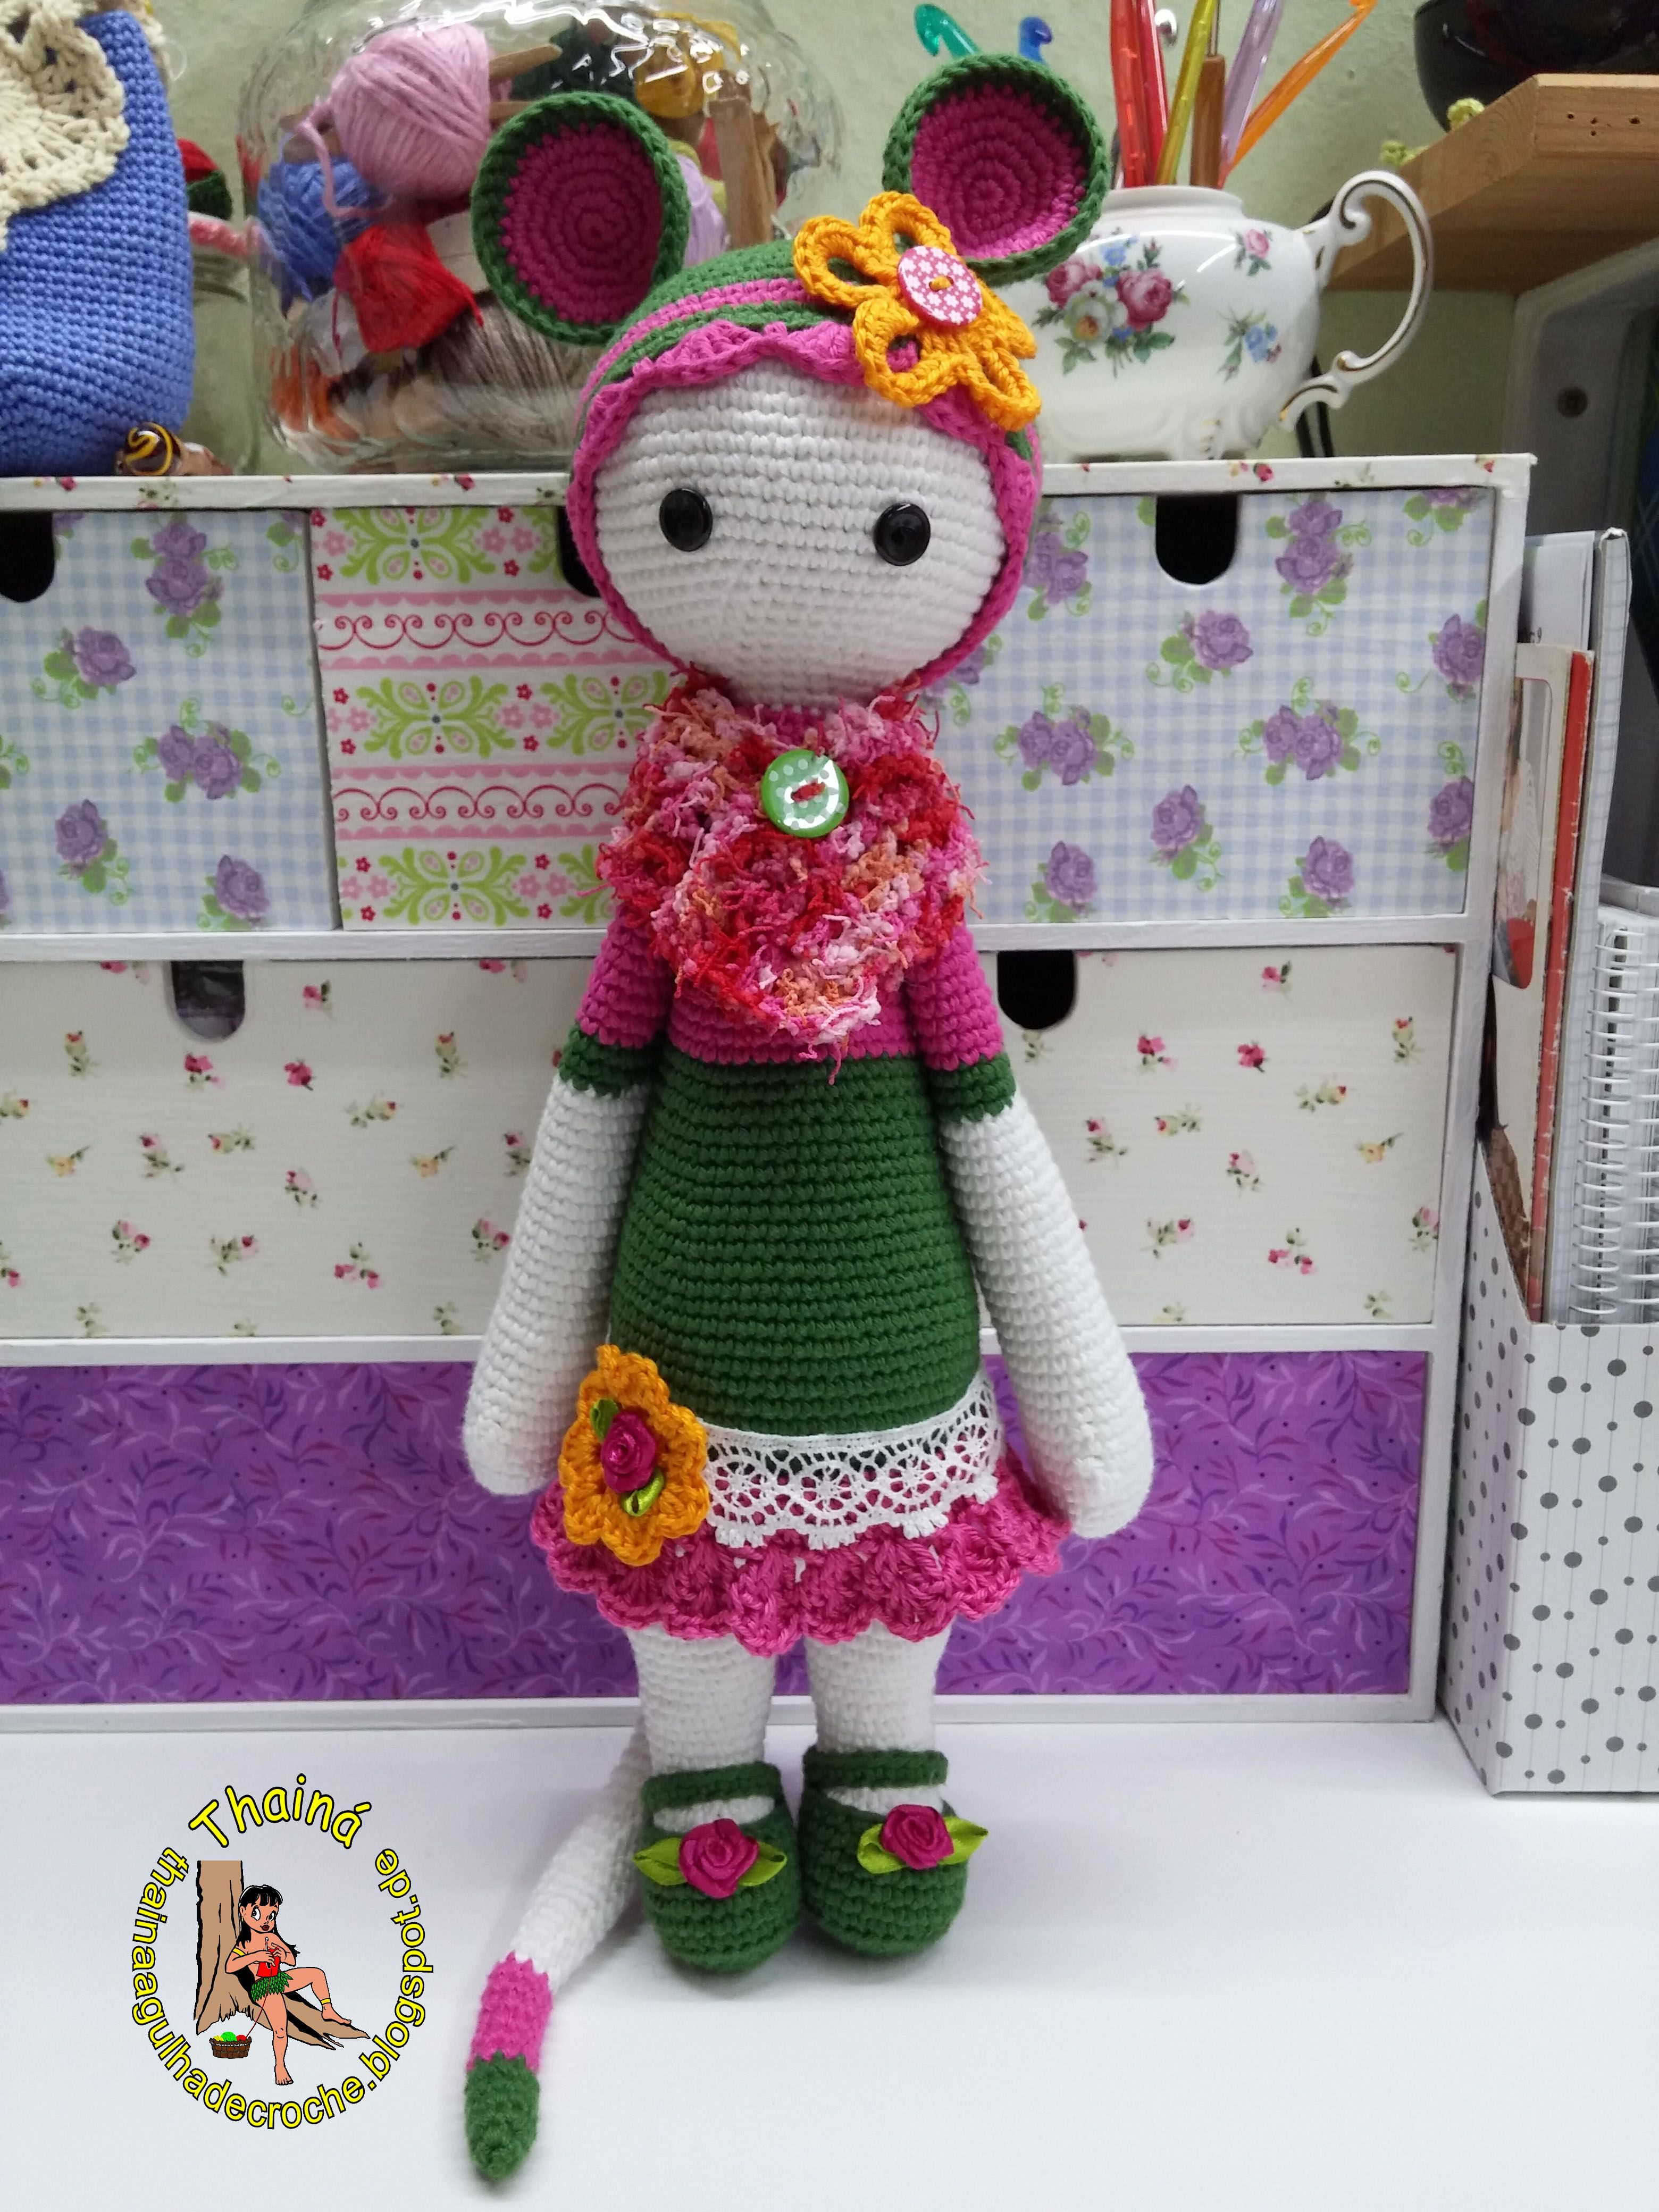 RADA the rat made by Rose K. / crochet pattern by lalylala